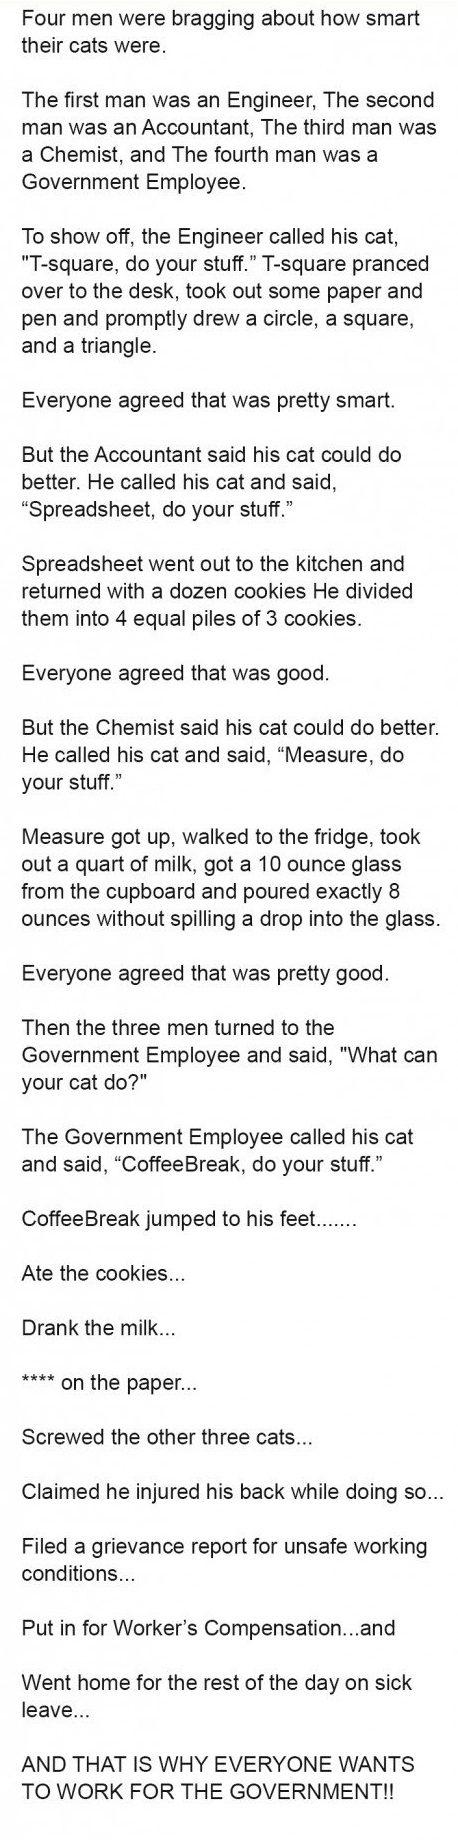 smartest cat